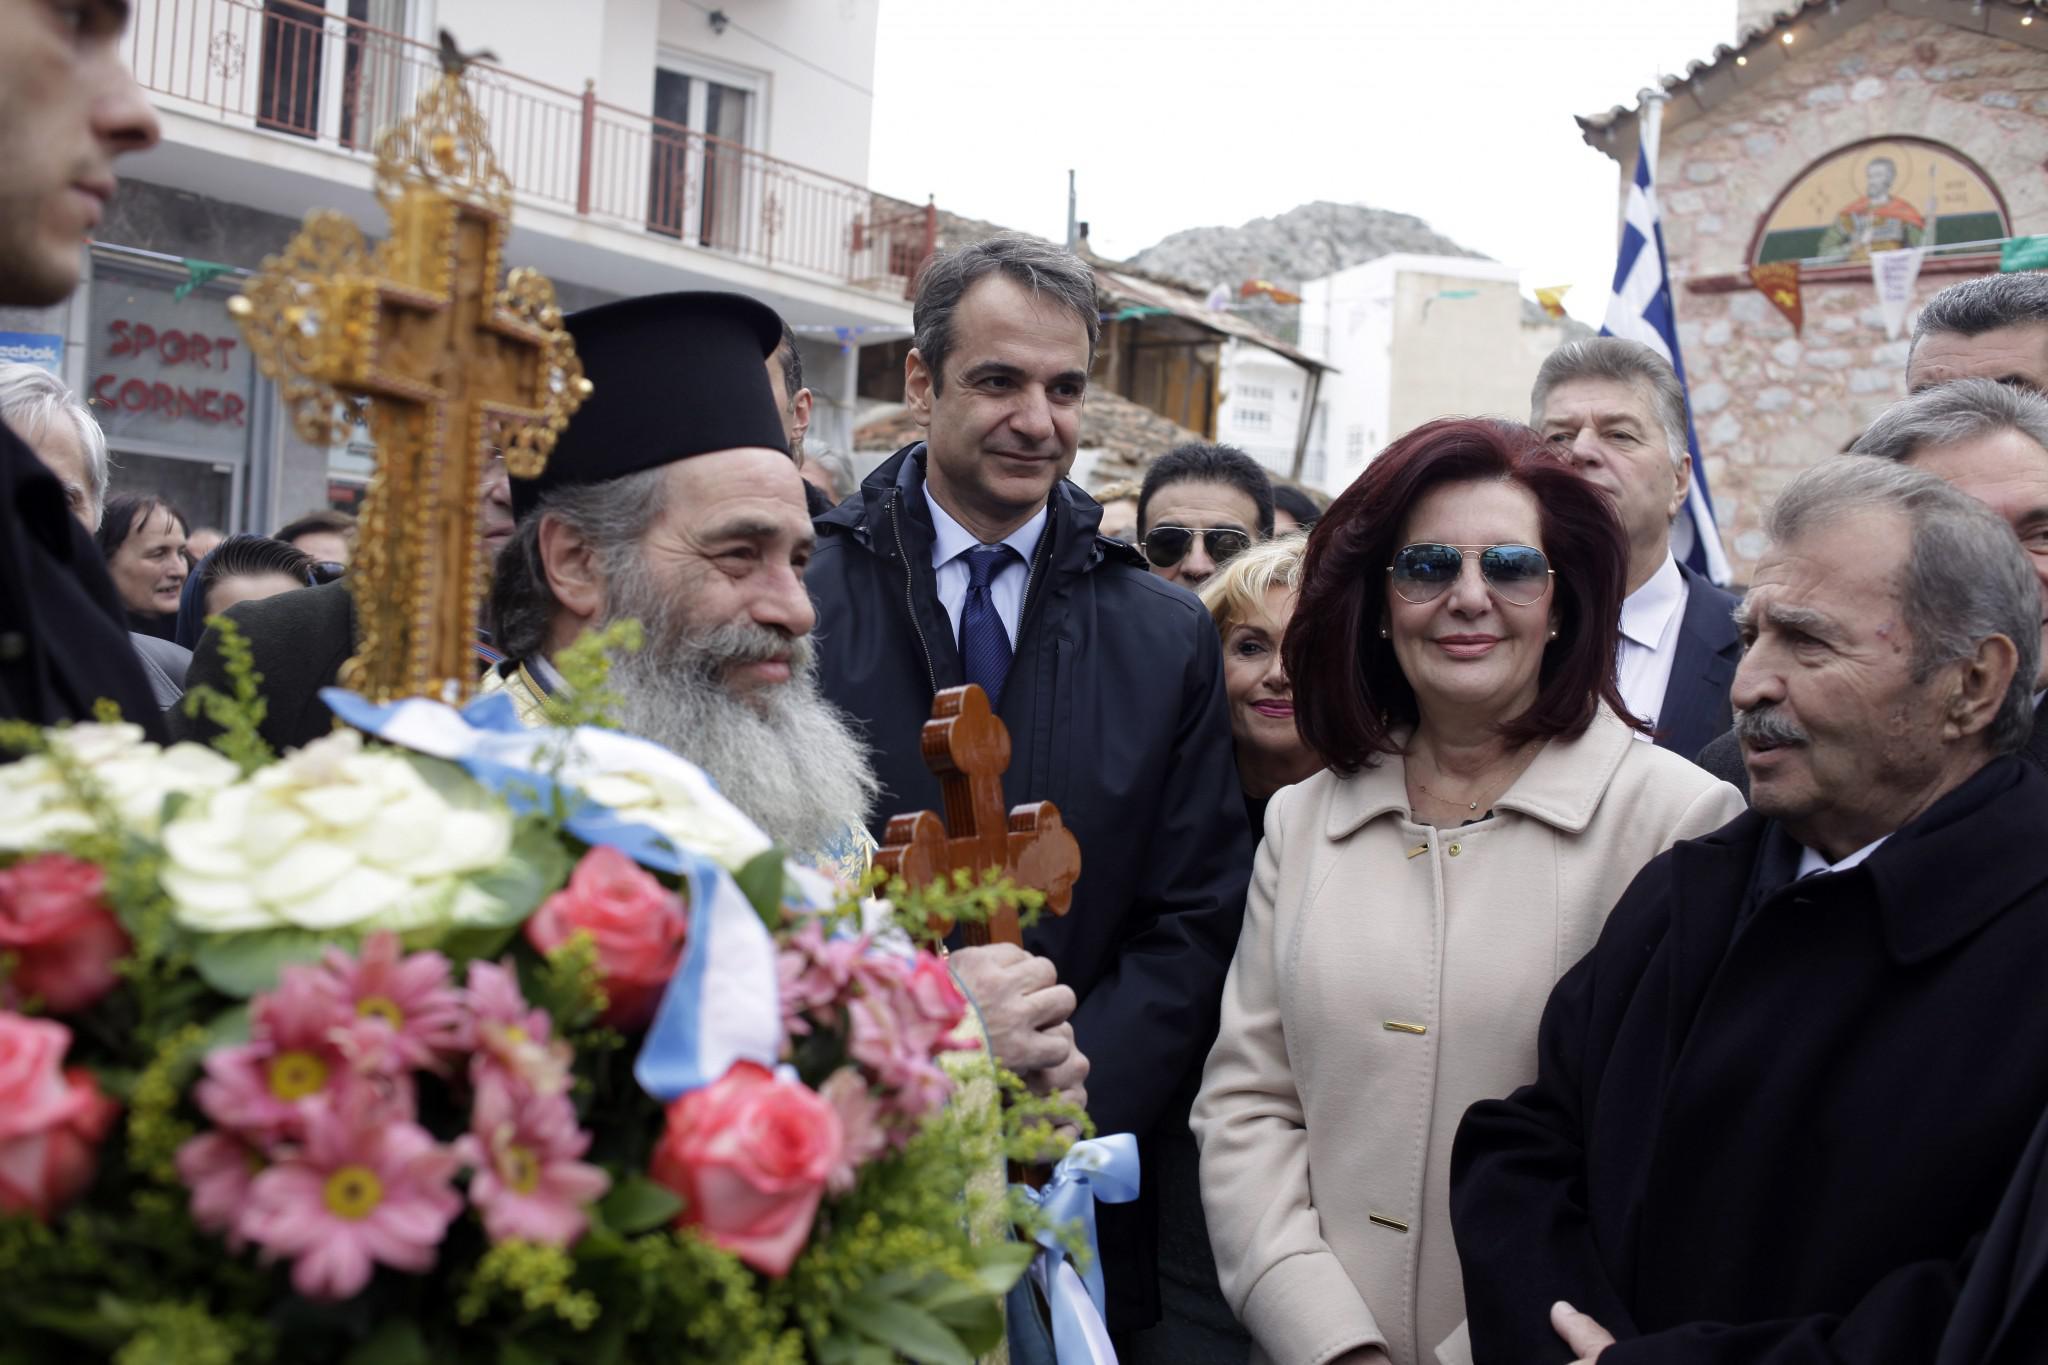 mitsotakis7-500 Μητσοτάκης: Είναι άμεση η ανάγκη για ενότητα [εικόνες]